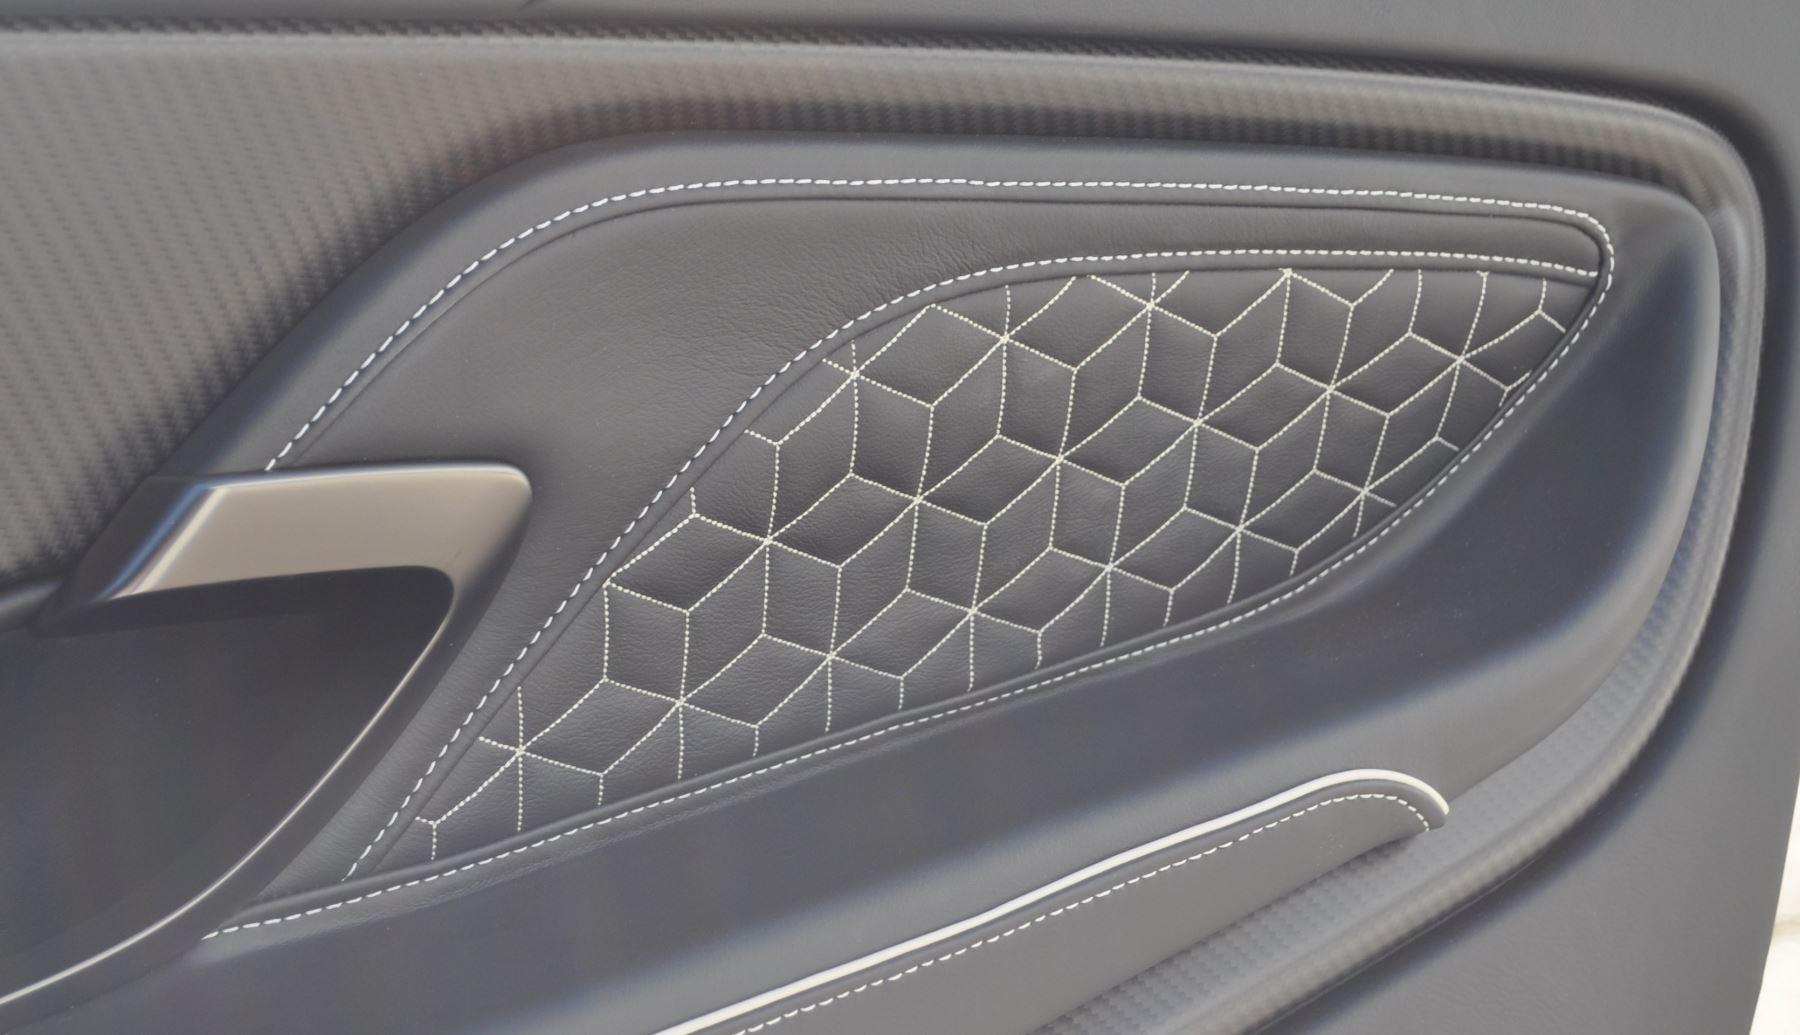 Aston Martin DBS V12 Superleggera 2dr Touchtronic image 27